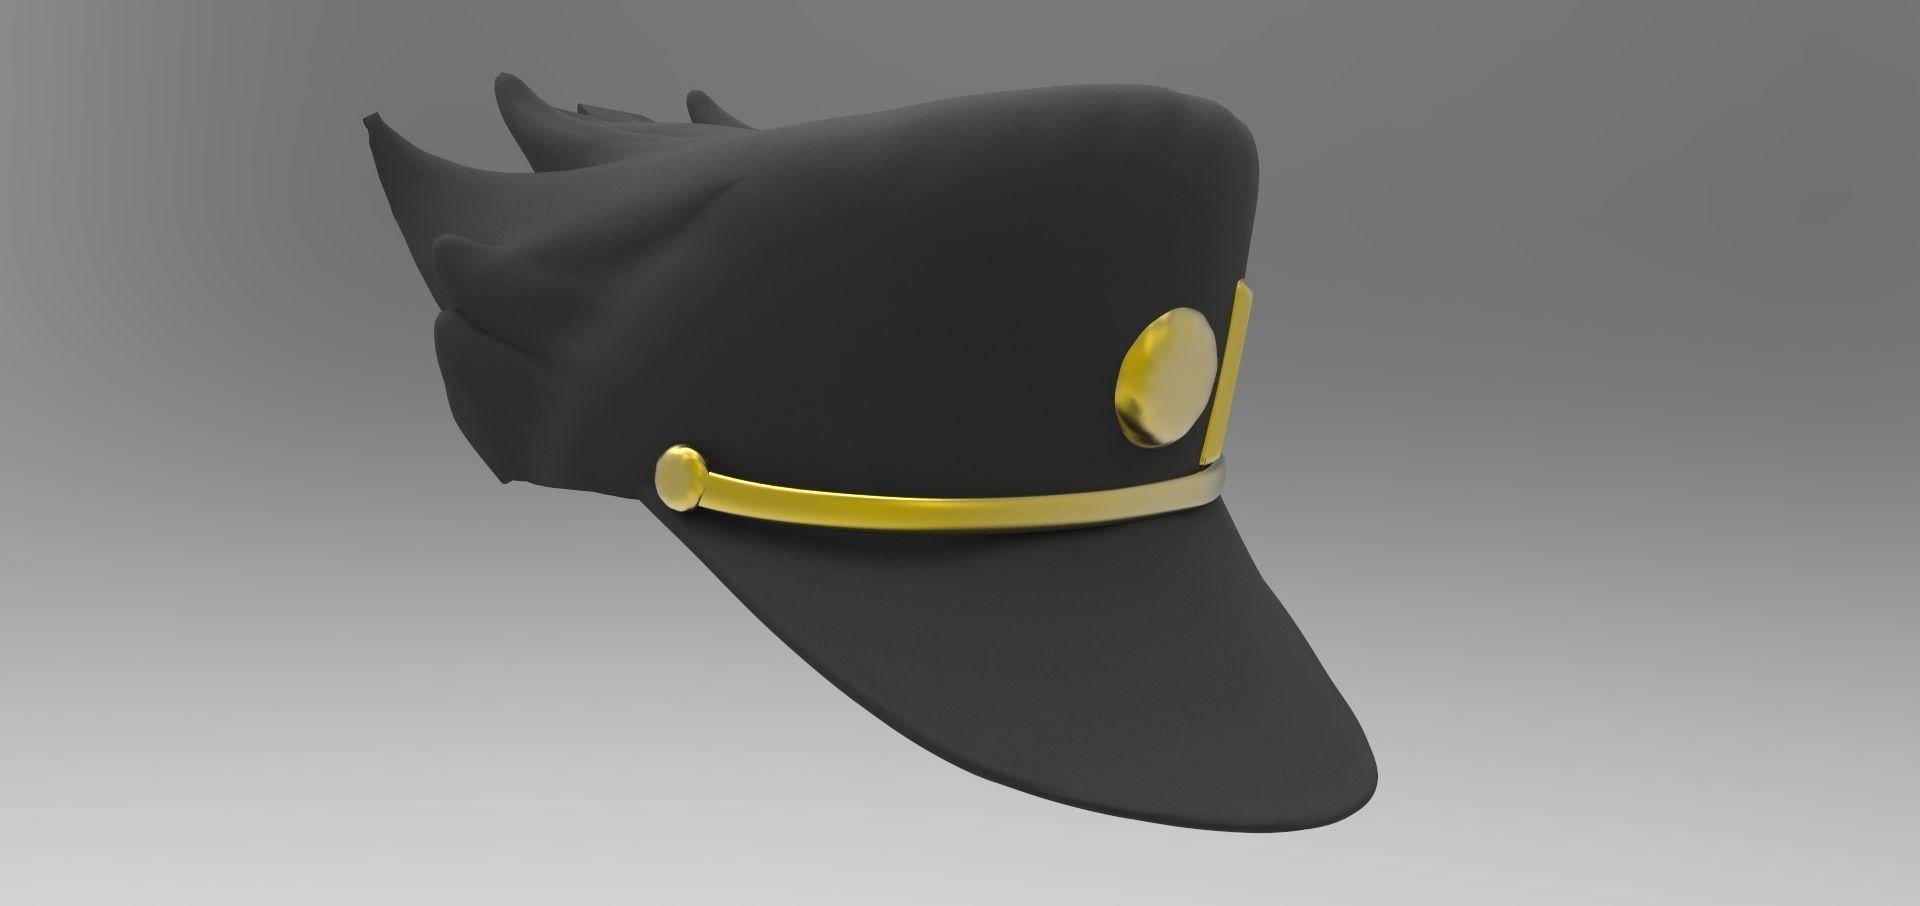 jojo-jotaro-kujo-cosplay-hat-3d